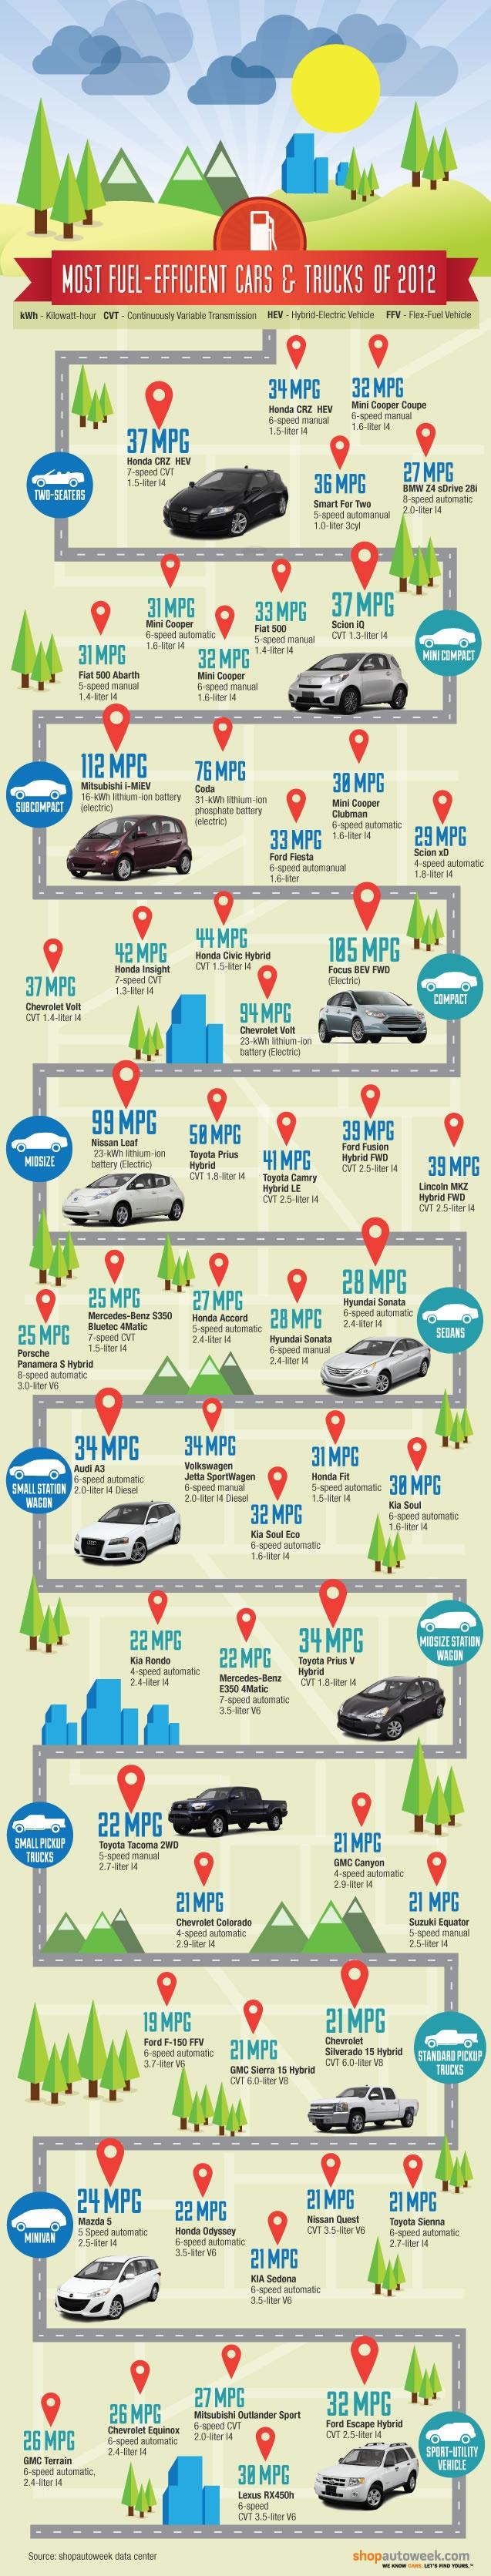 2012 most fuel efficient vehicles